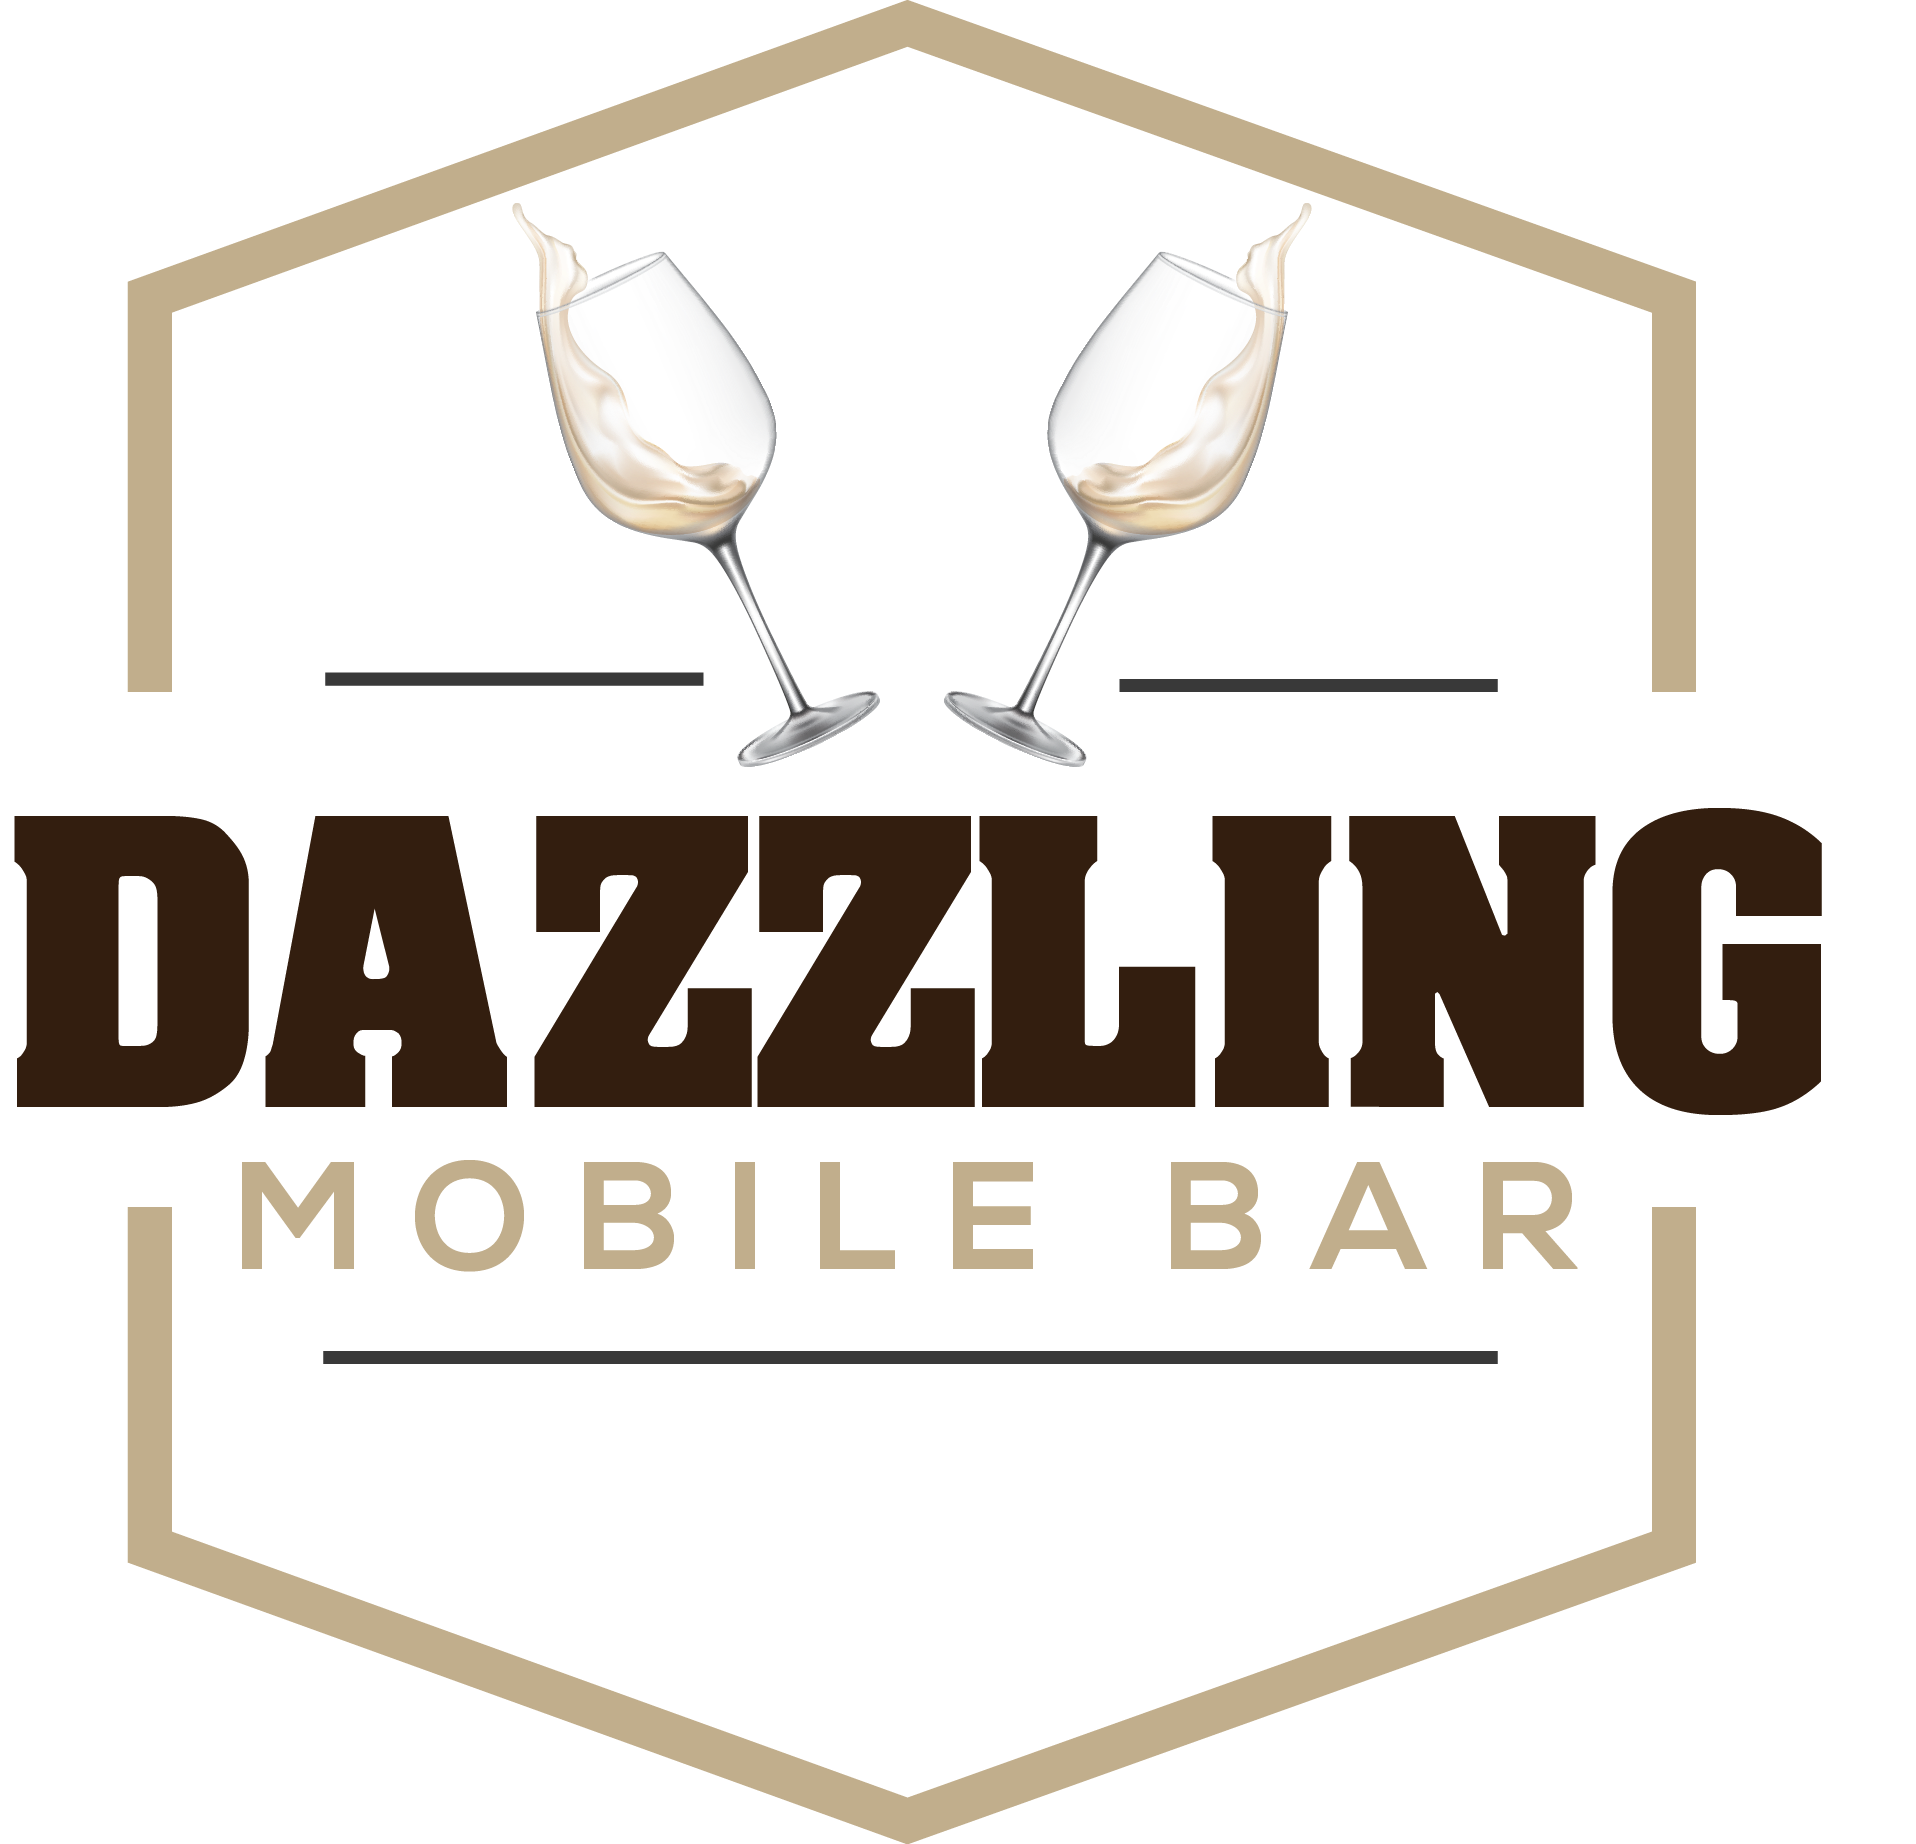 Dazzling Mobile Bar Icon